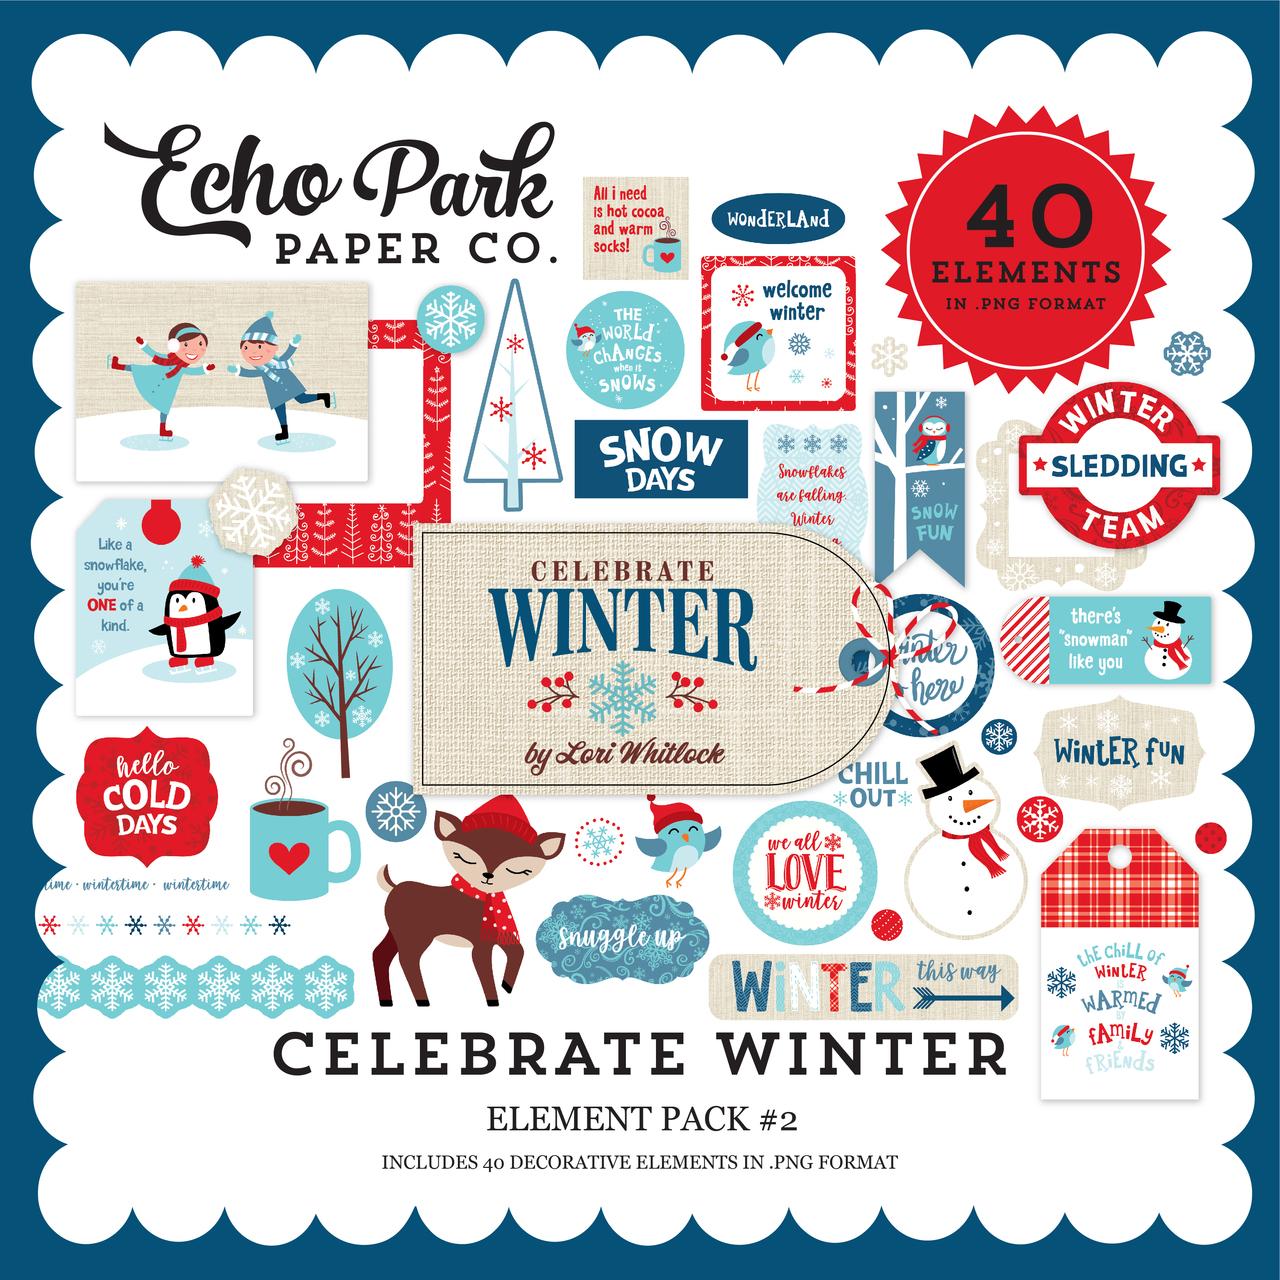 Celebrate Winter Element Pack #2